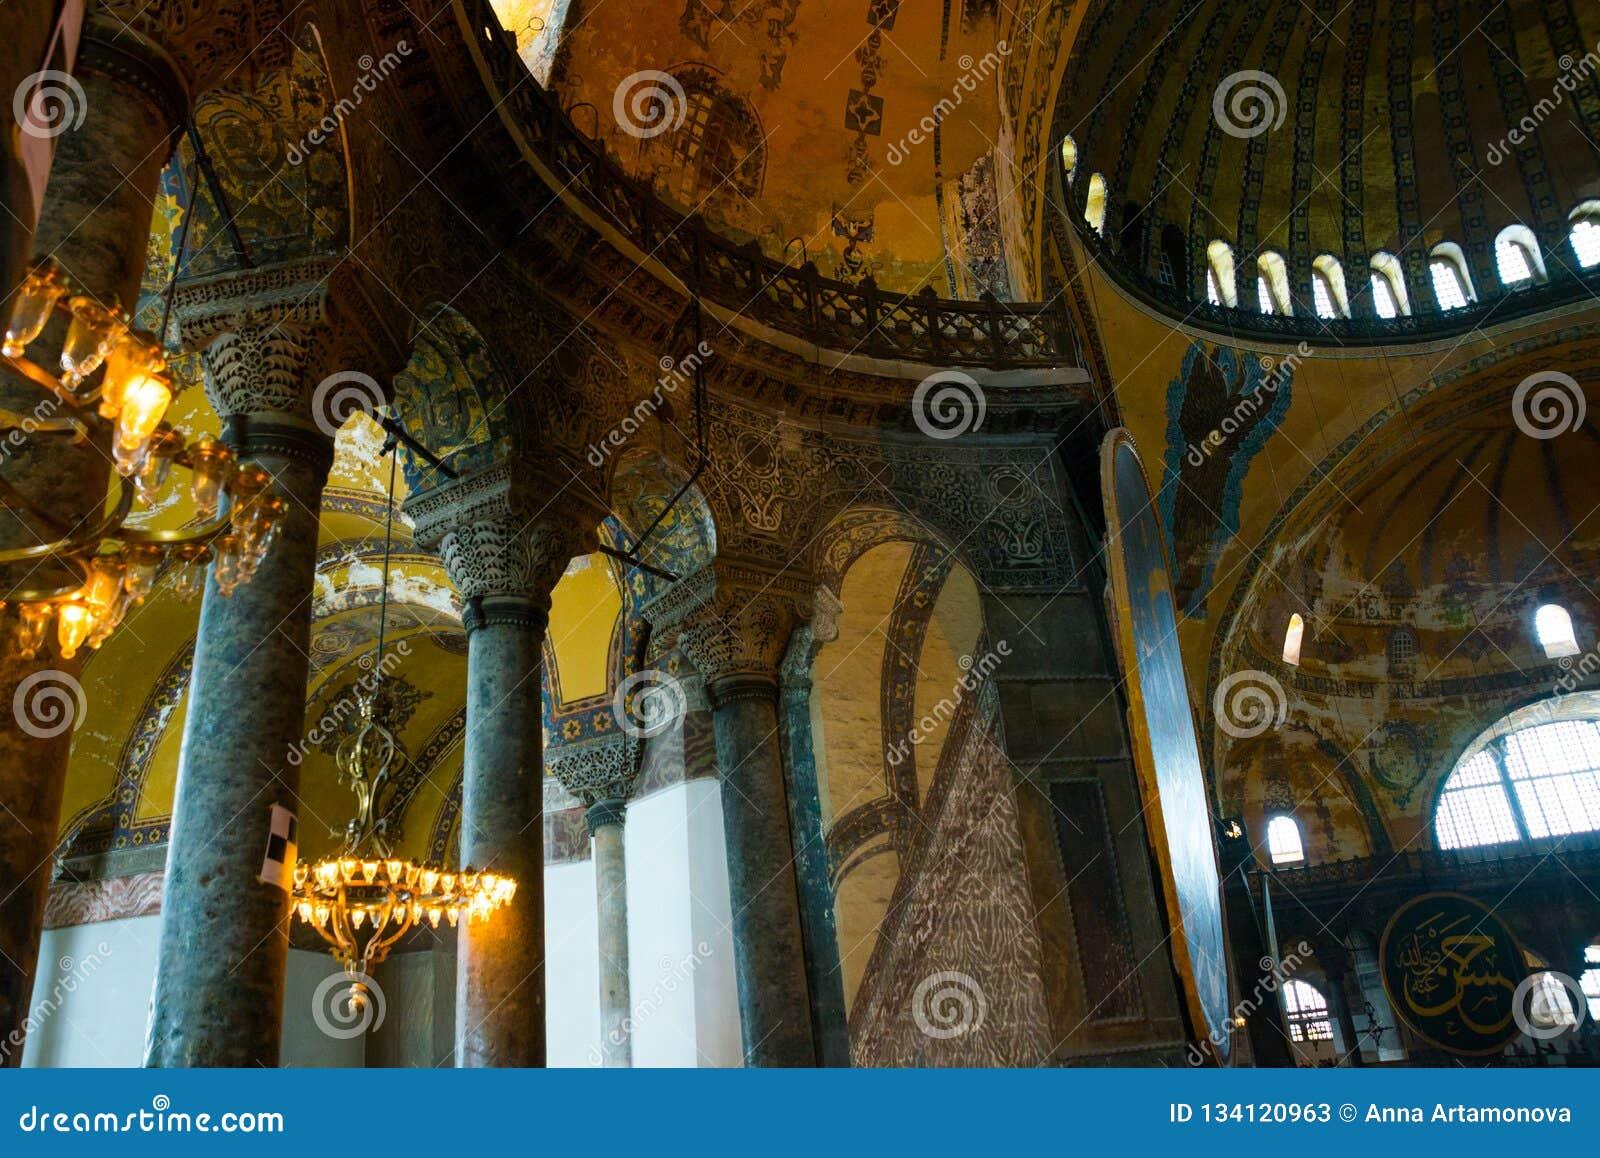 ISTANBUL, TURKEY: Hagia Sophia interior. Hagia Sophia is the greatest monument of Byzantine Culture